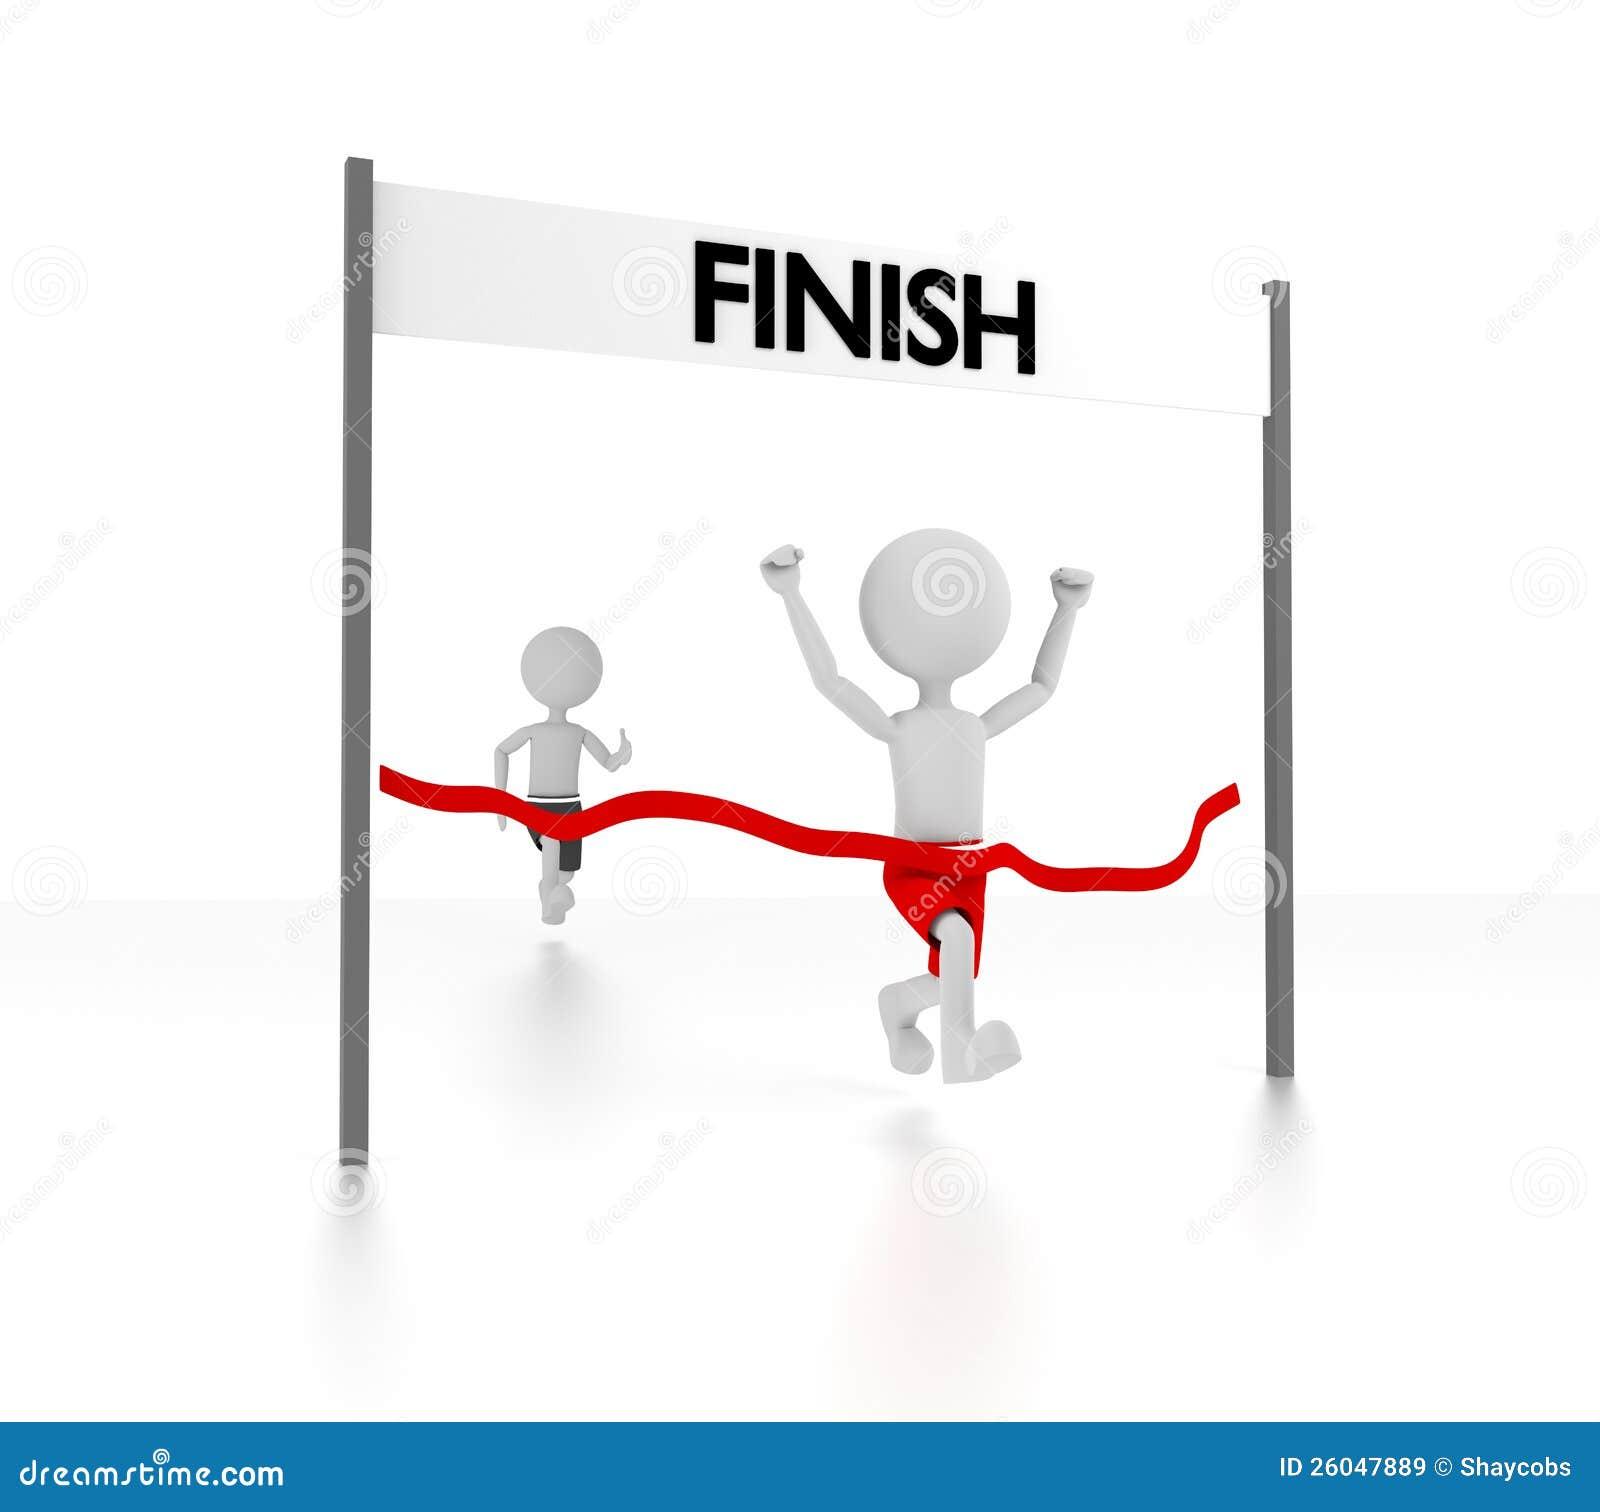 Finish Line, Inc.